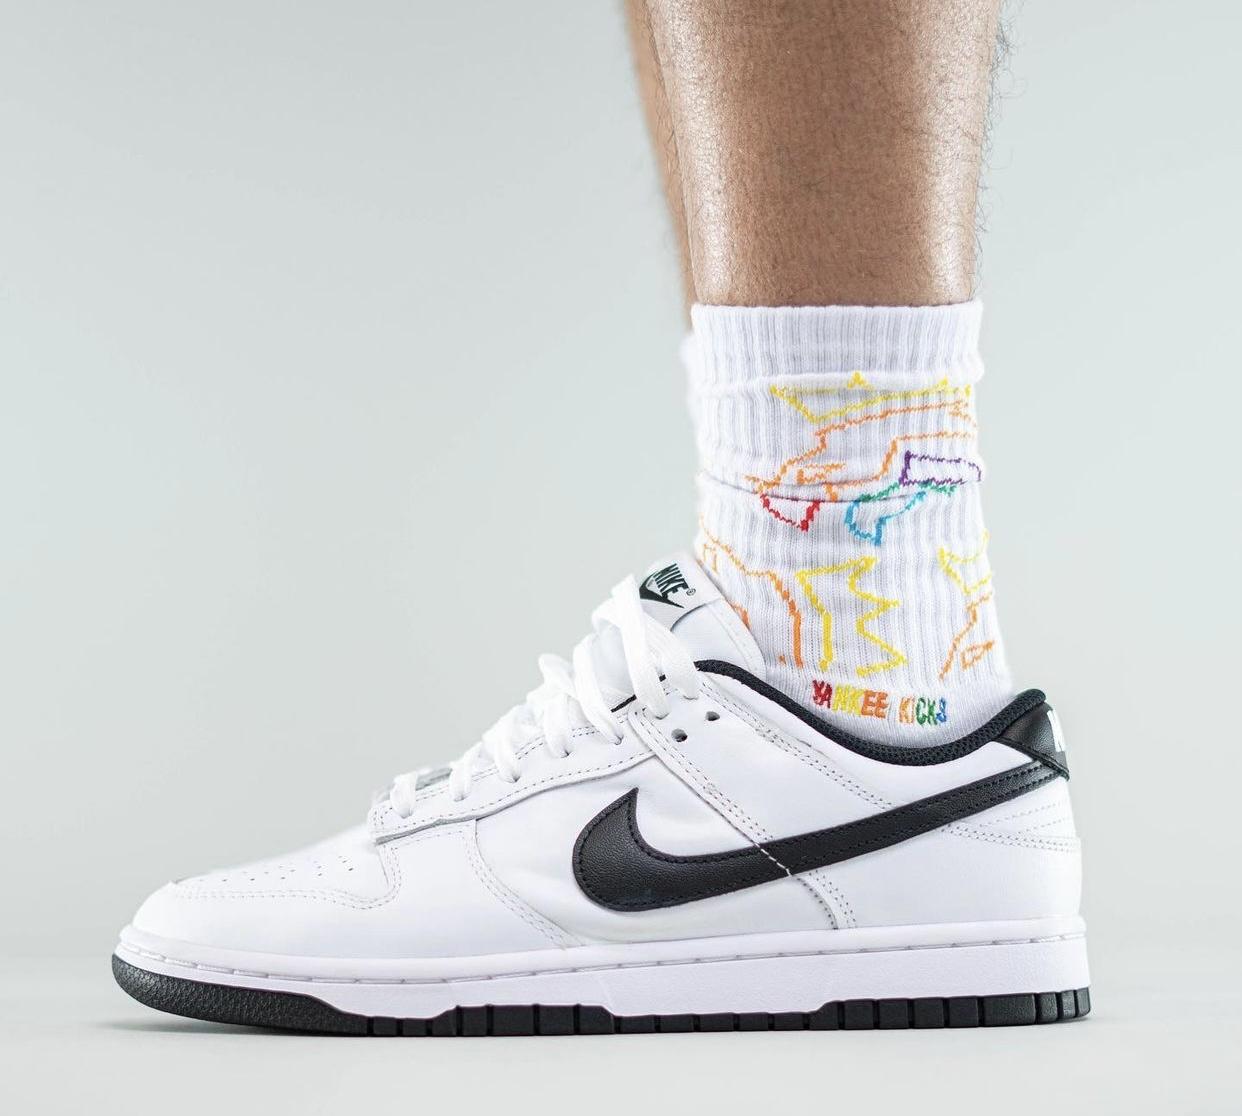 Nike Dunk Low White Black Release Date Info